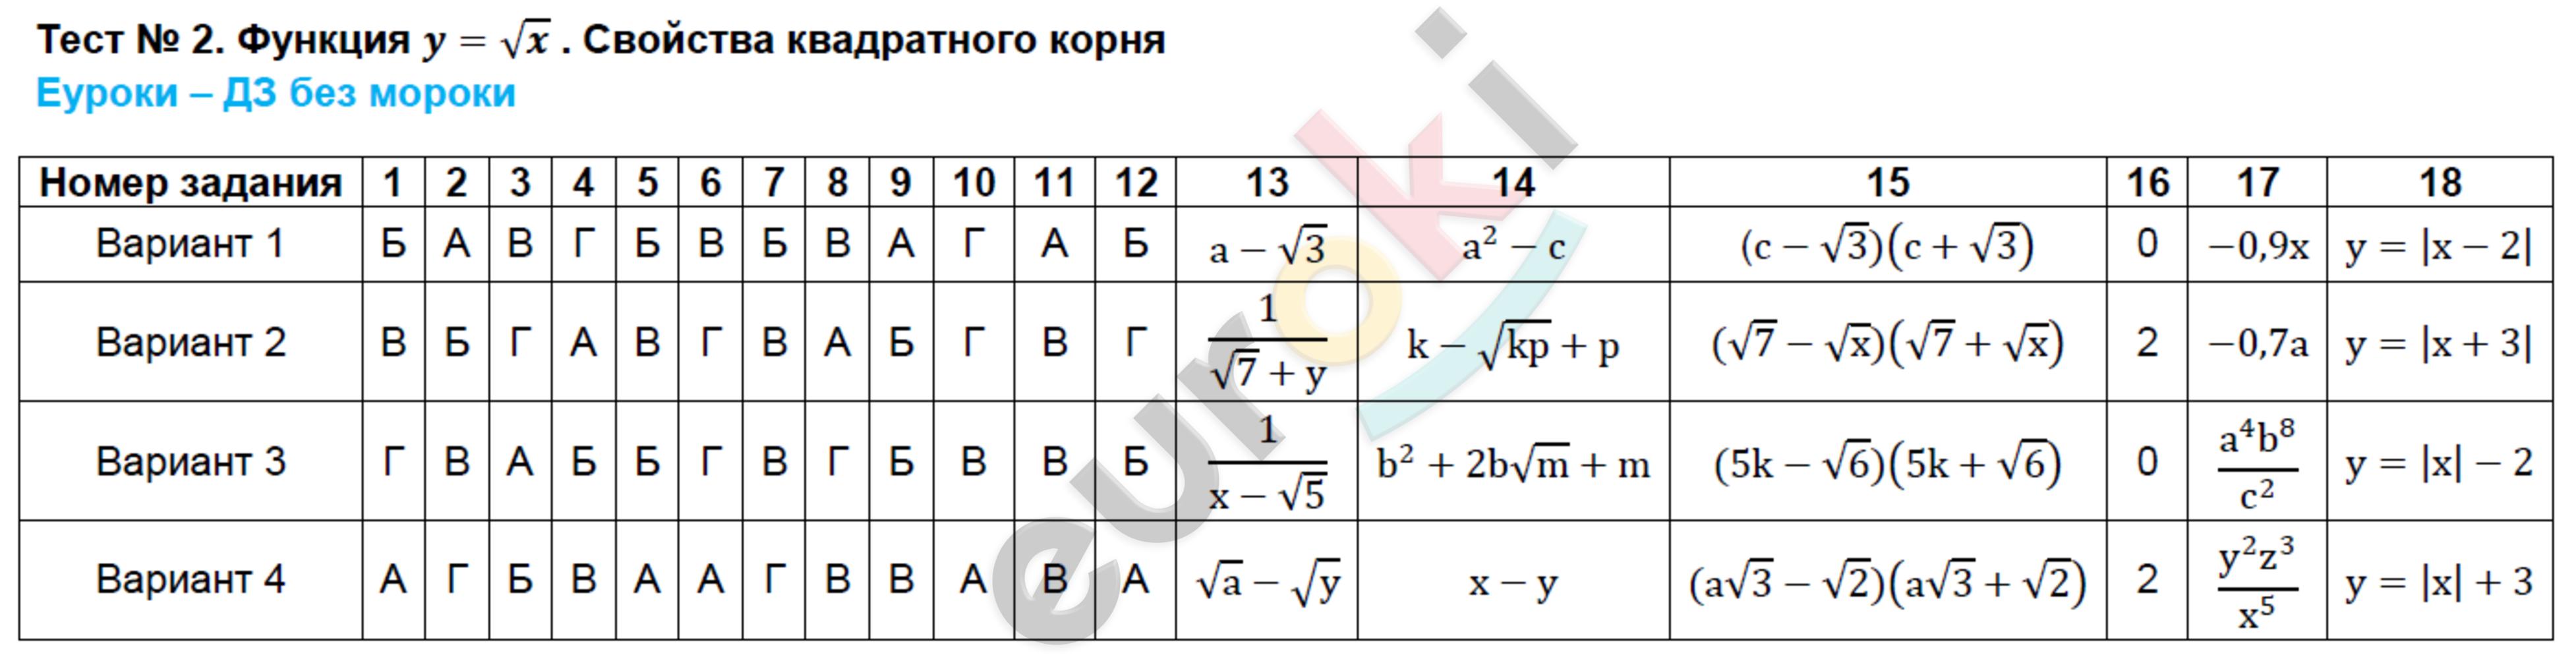 ГДЗ по алгебре 8 класс тесты Ключникова, Комиссарова. К учебнику Мордковича. Задание: Тест 2. Функция y=√x . Свойства квадратного корня